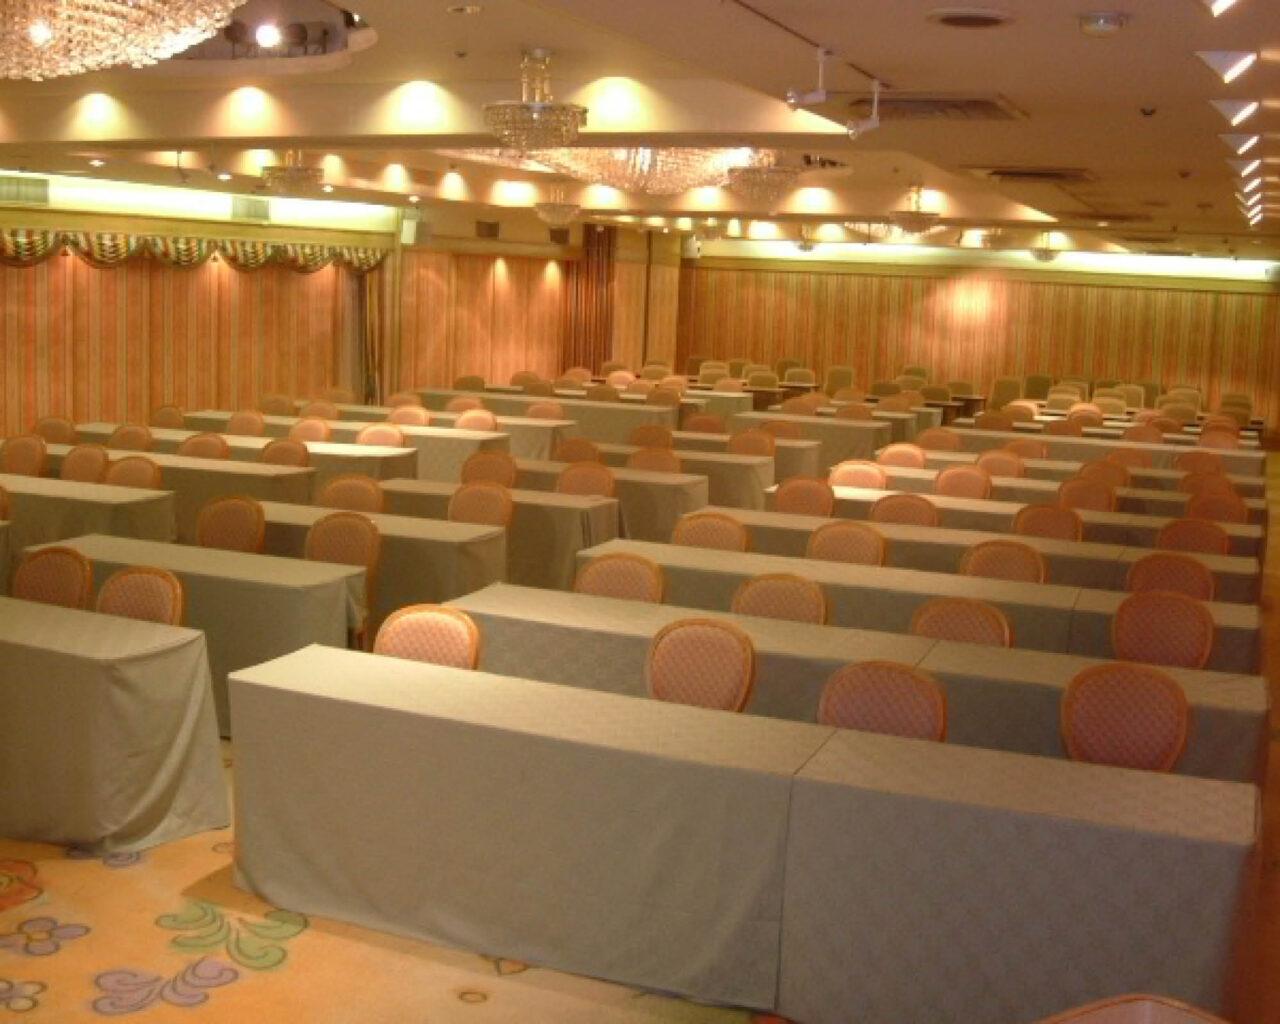 https://www.shizuoka-cb.com/wp-content/uploads/2021/03/photo-venues21-1280x1024.jpg